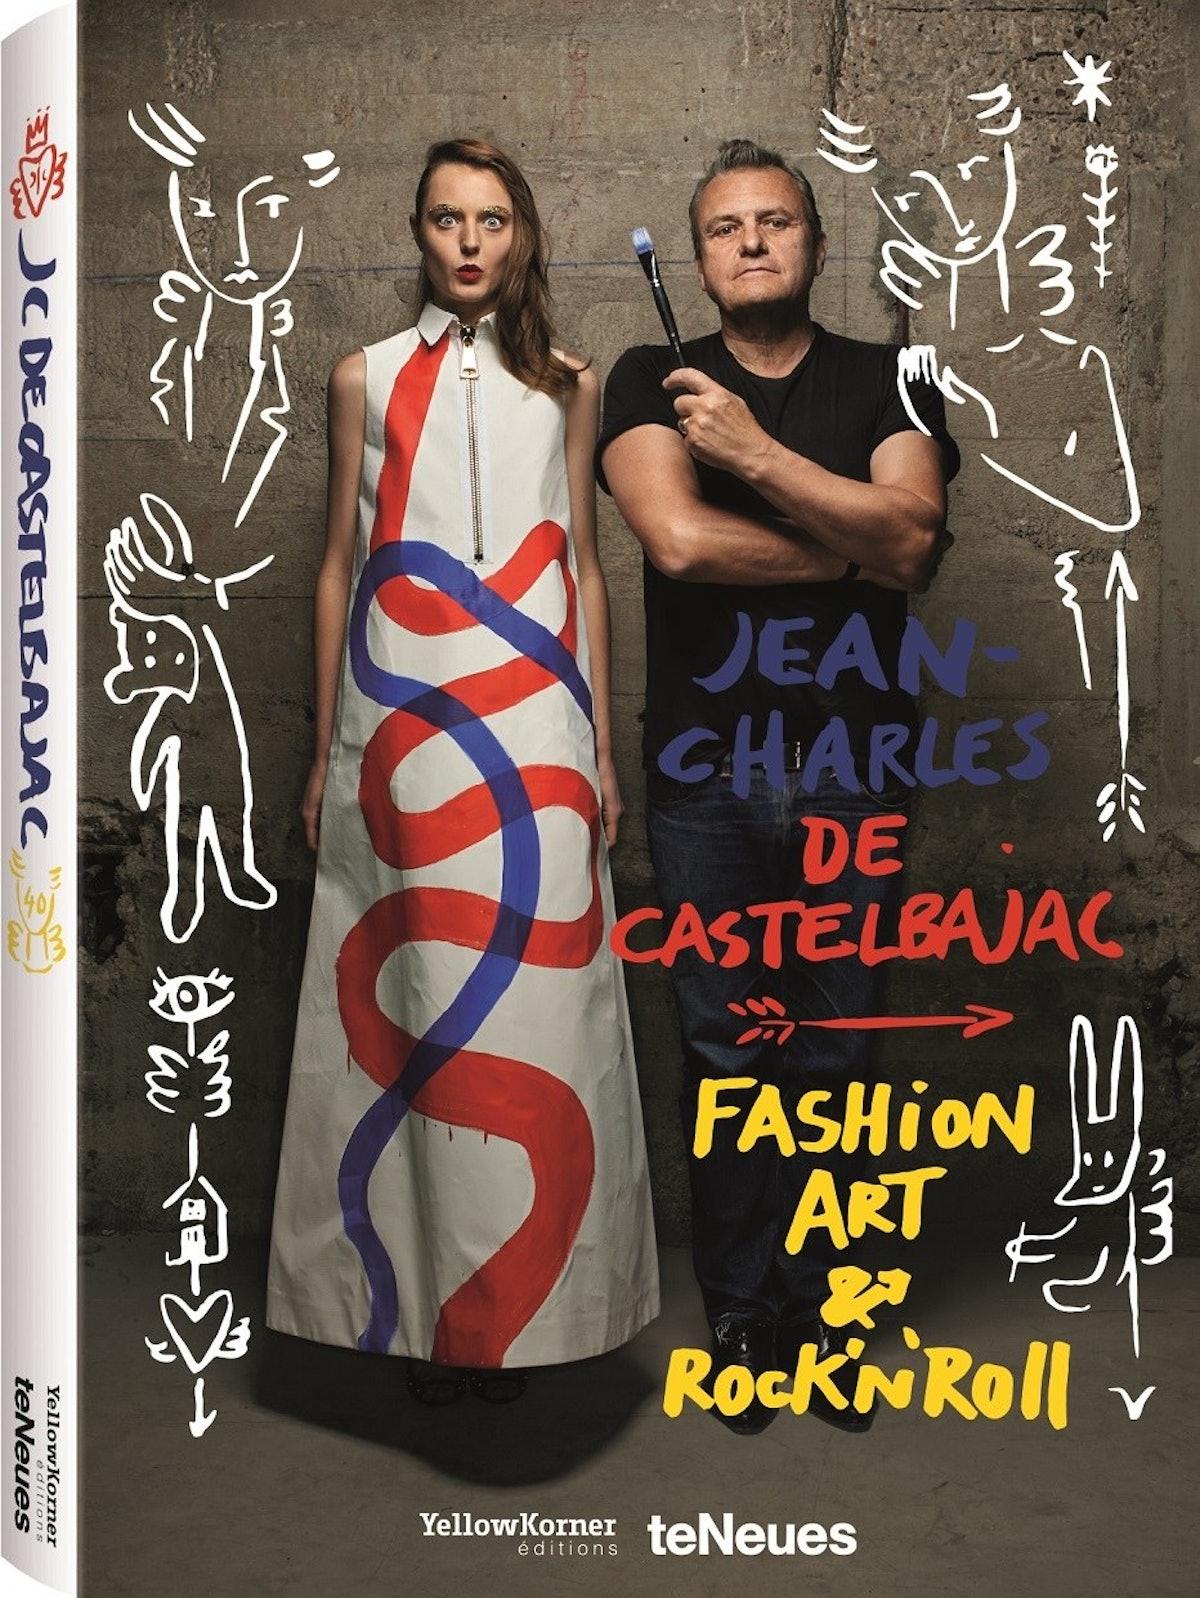 cover of Castelbajac web.jpg